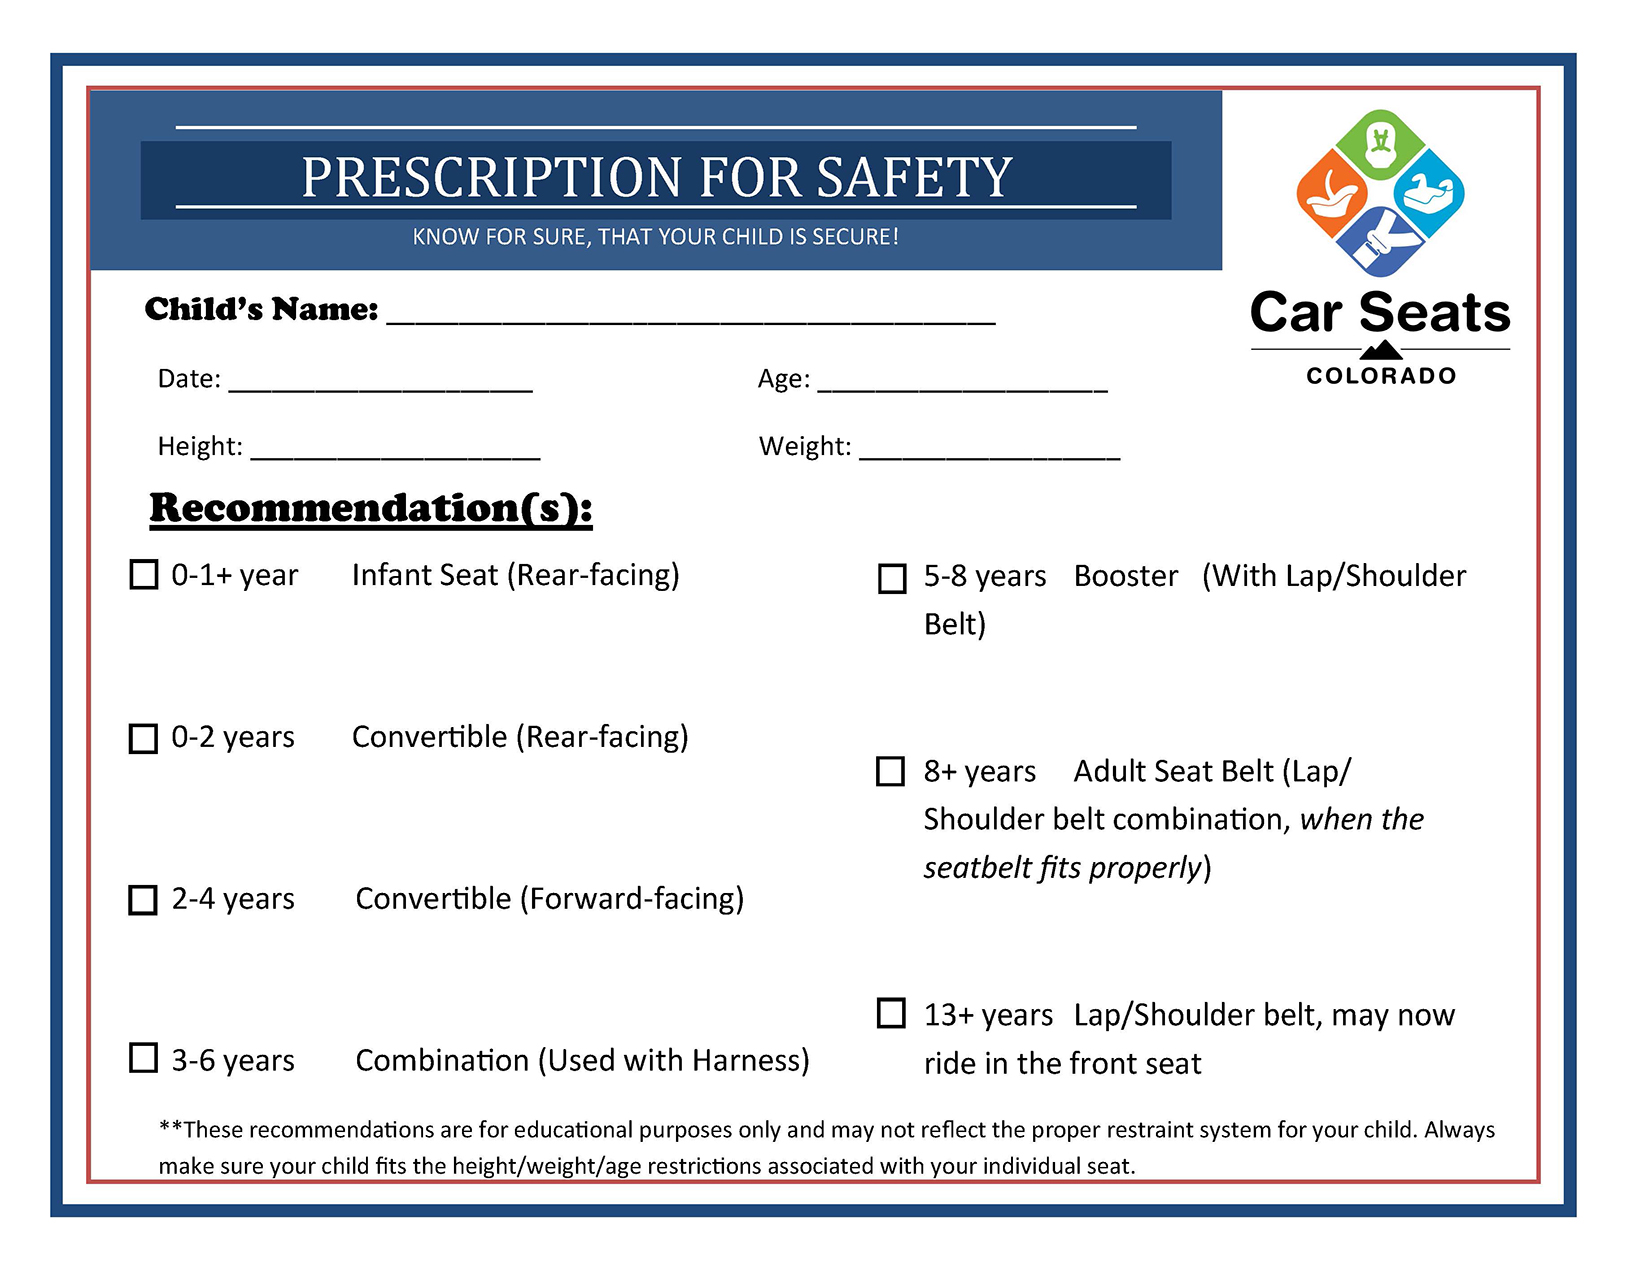 Prescription Child Safety Card